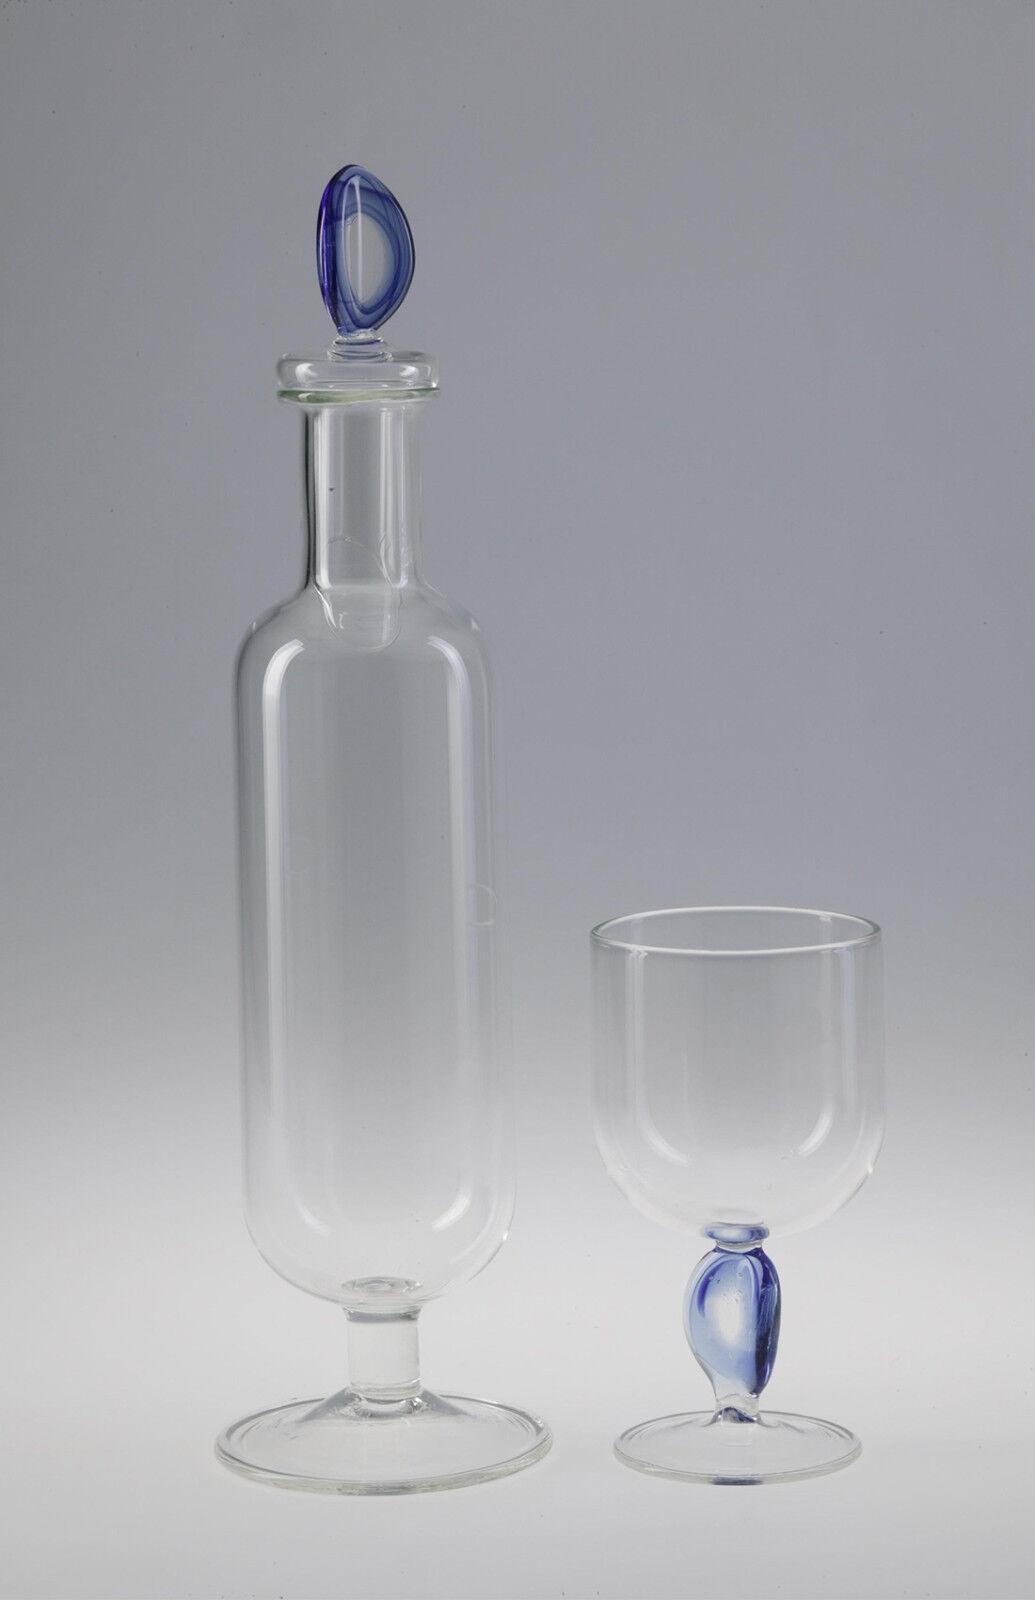 Massimo lunardon-eau carafes avec 6 verres. handgeblasenes kunstglas